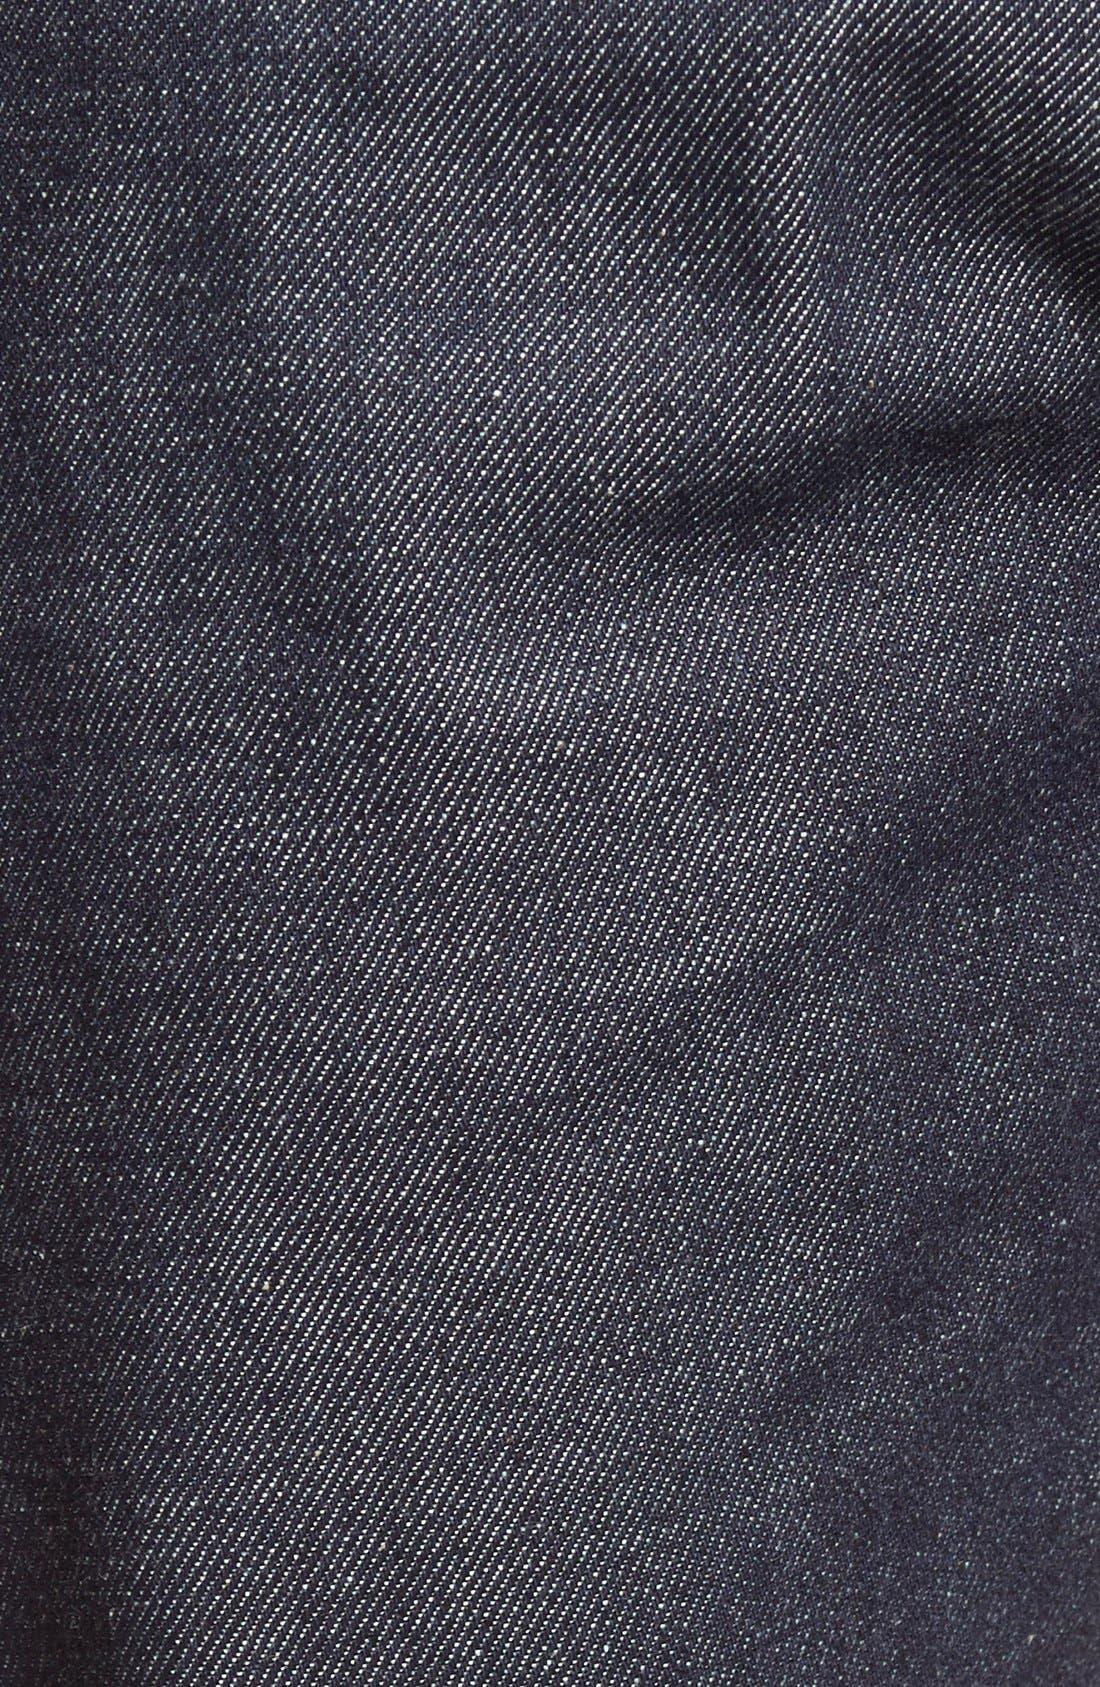 Super Skinny Guy Skinny Fit Selvedge Jeans,                             Alternate thumbnail 5, color,                             INDIGO